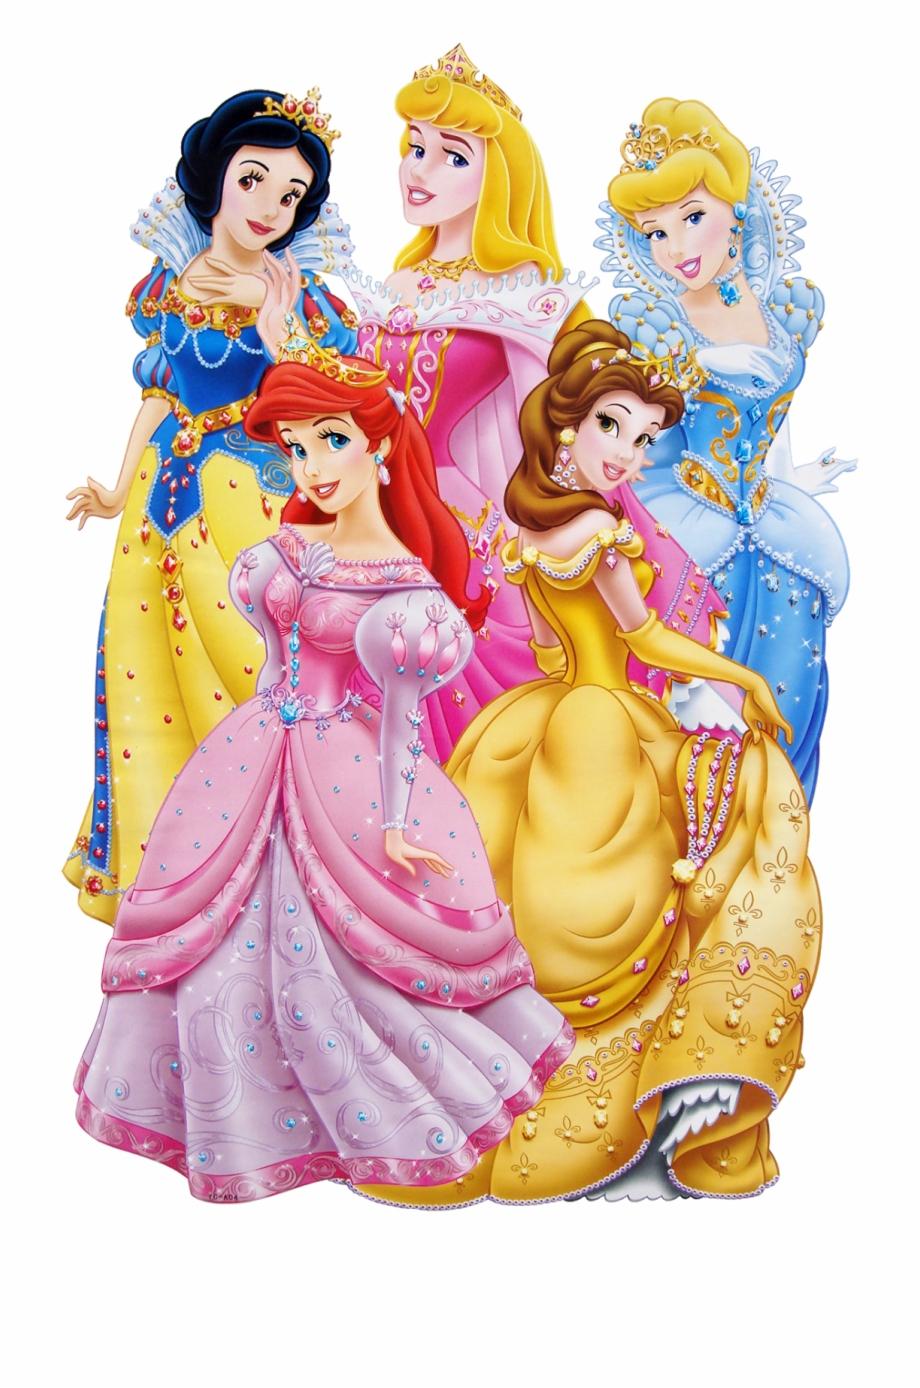 5 Princesas De Disney Png Download 5 Disney Princesses